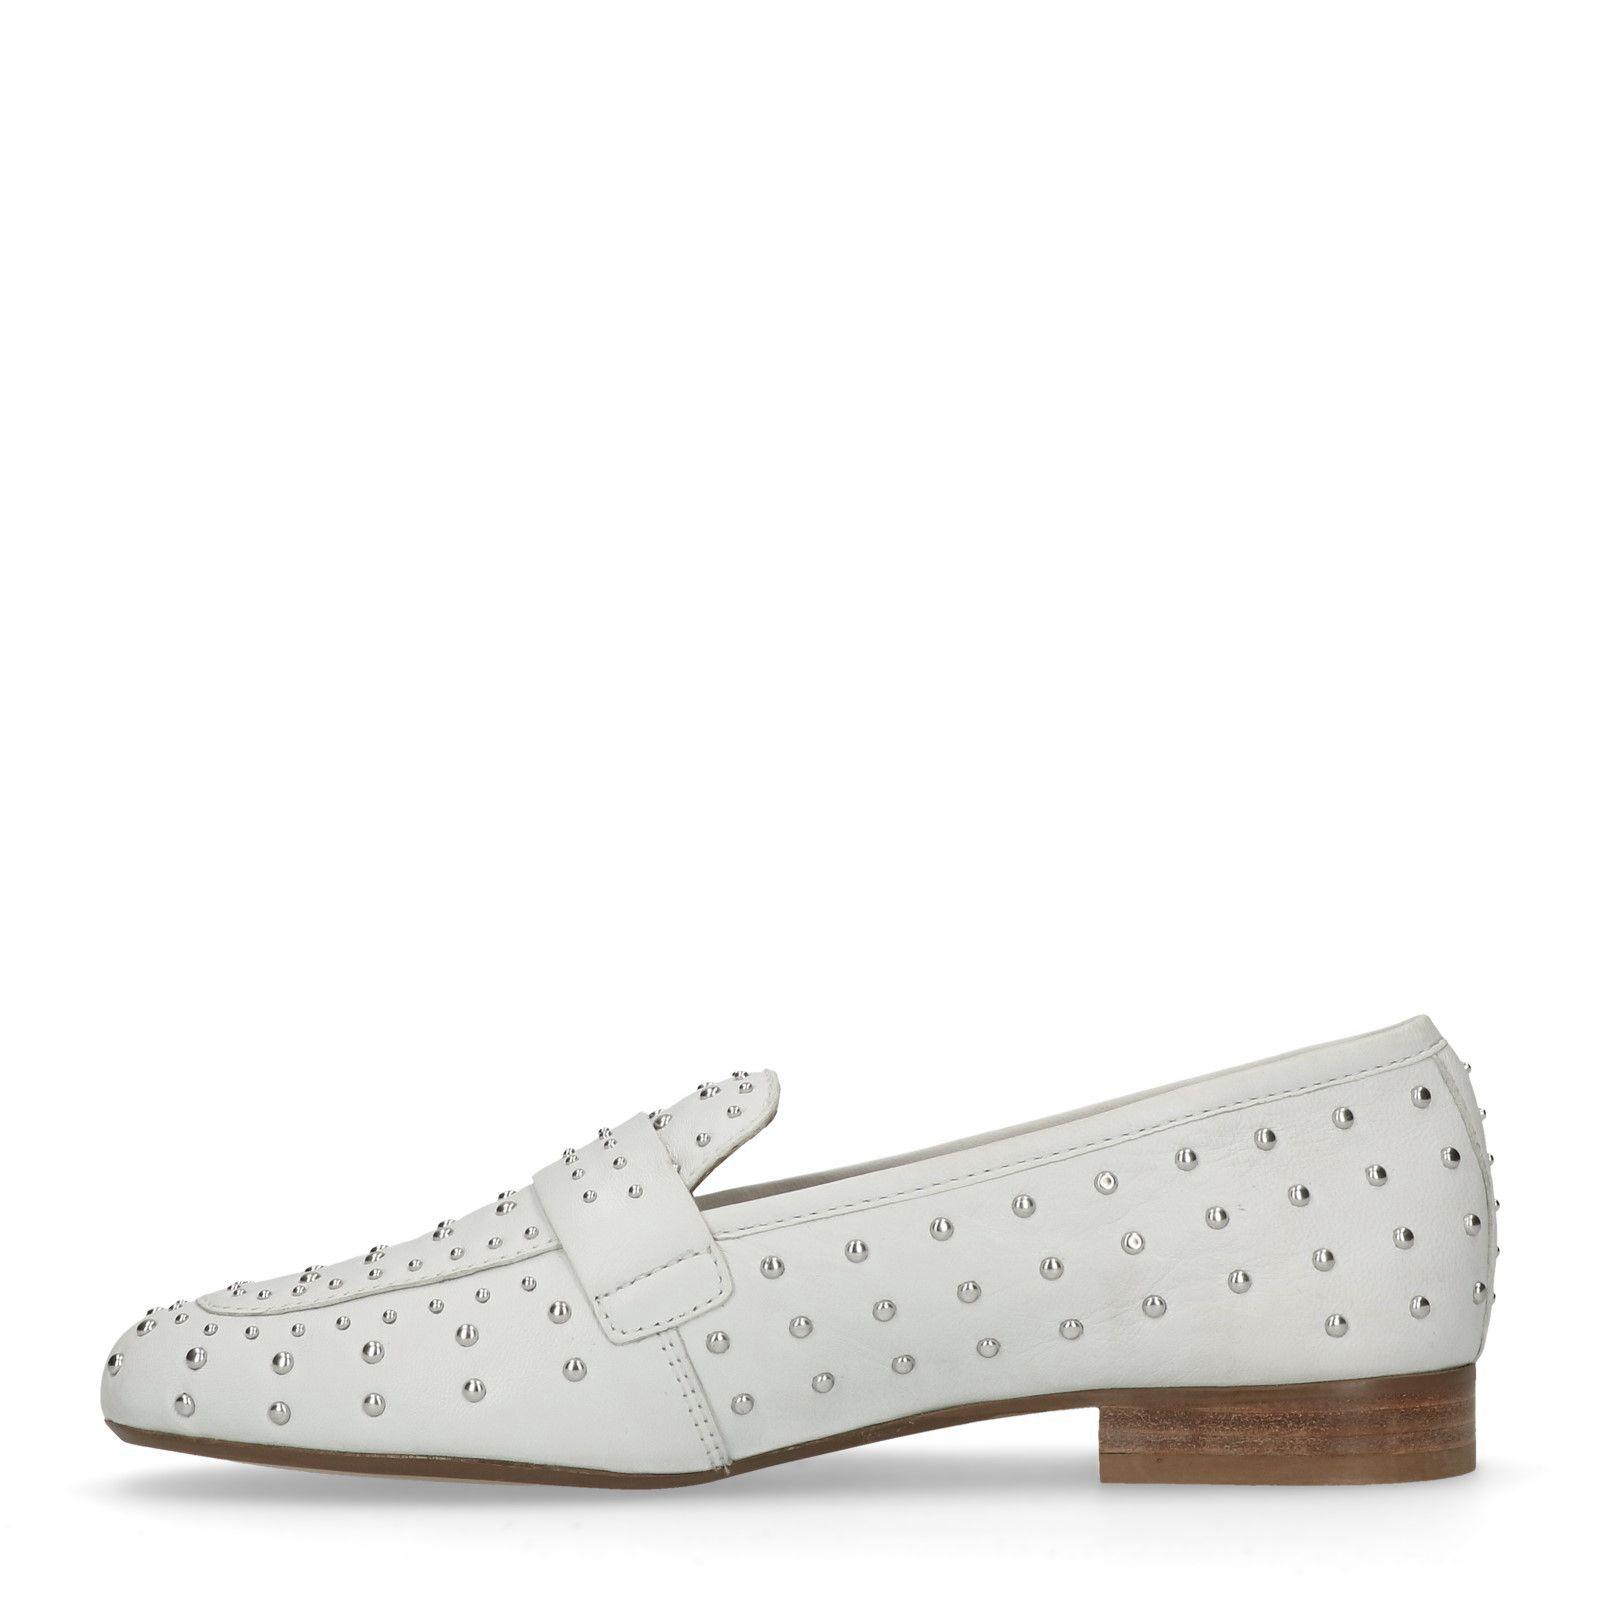 61e51ce49da Witte loafers met studs - Dames | MANFIELD